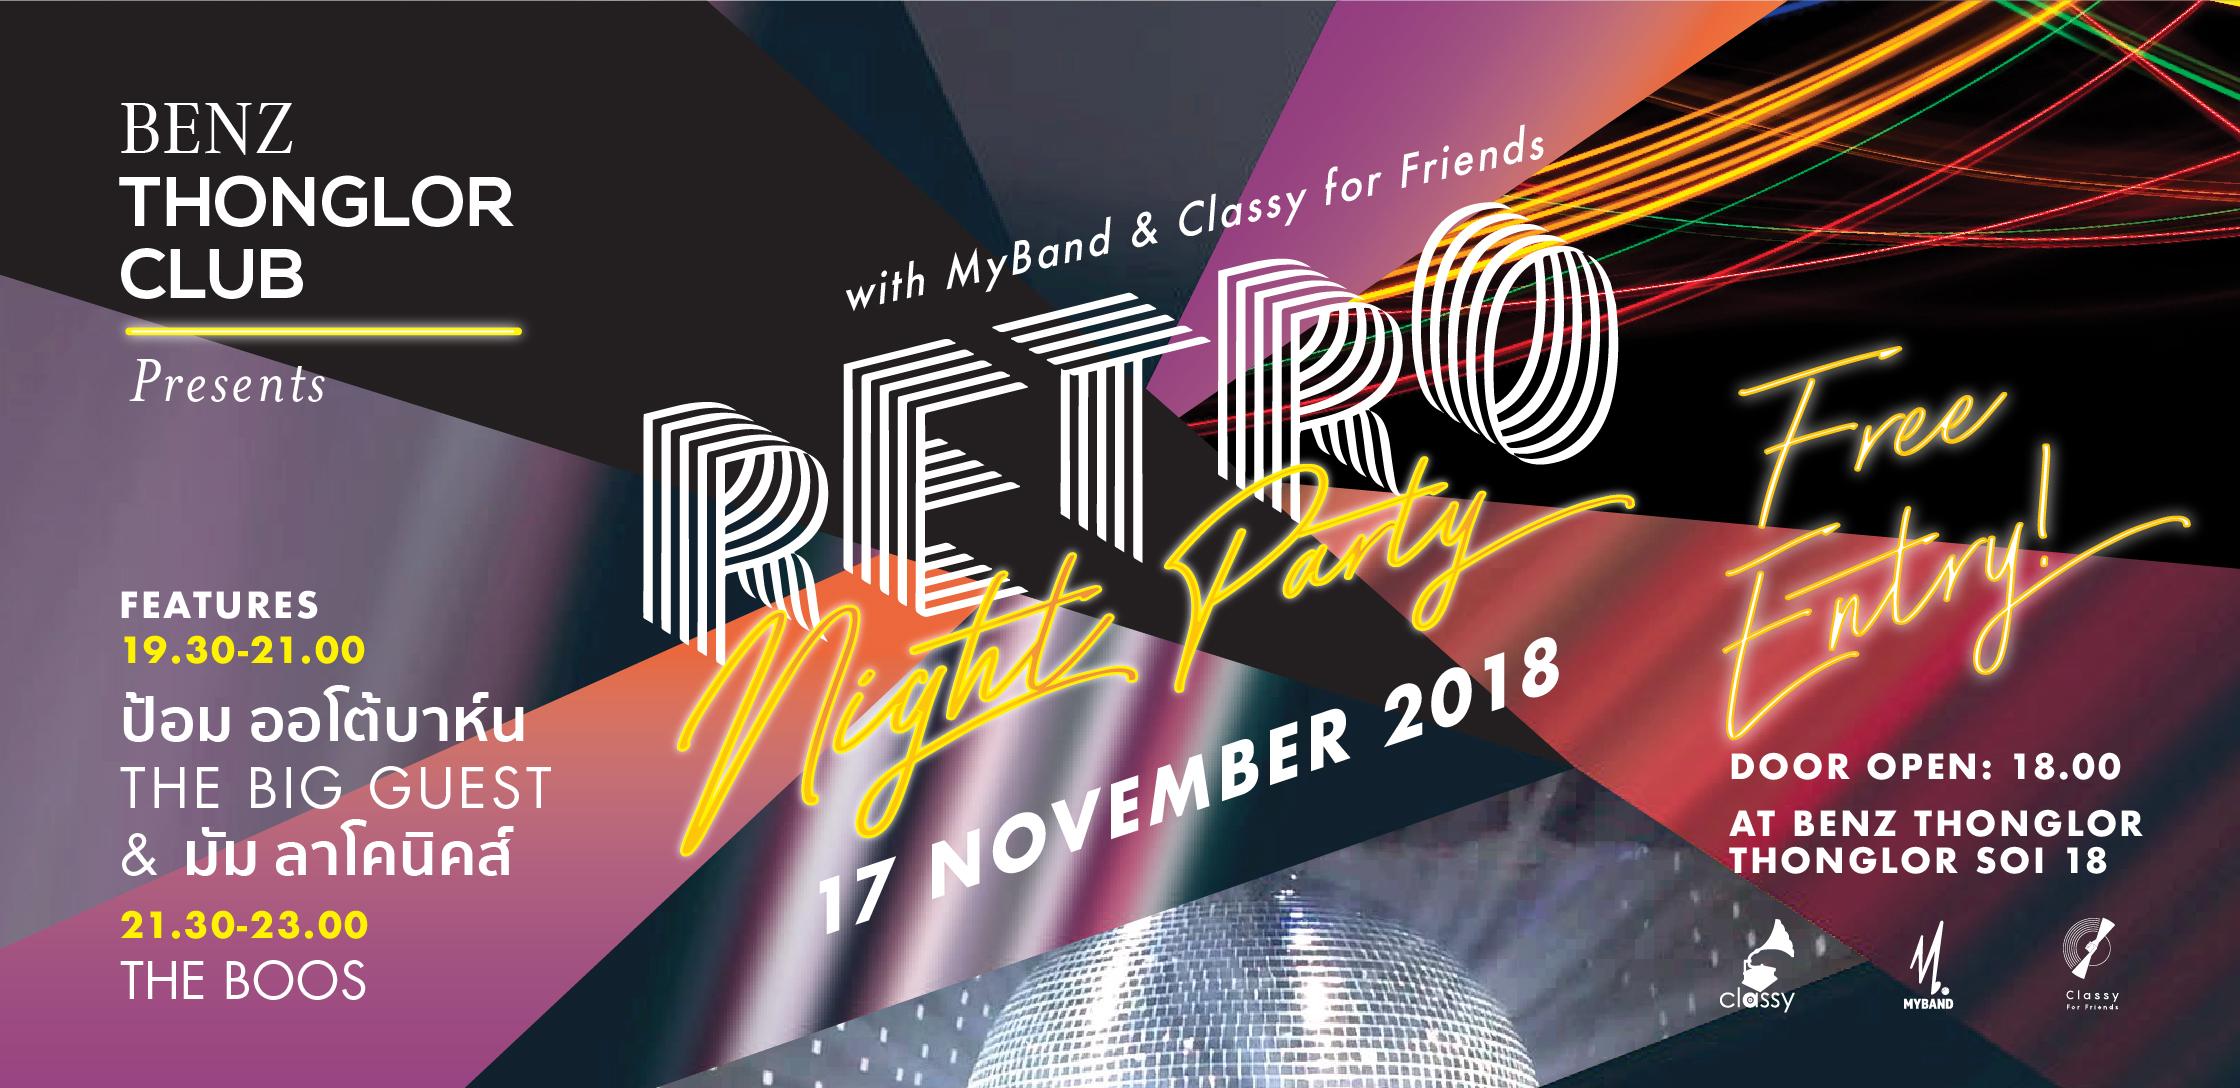 "Benz Thonglor Club presents ""Retro Night Party2"""